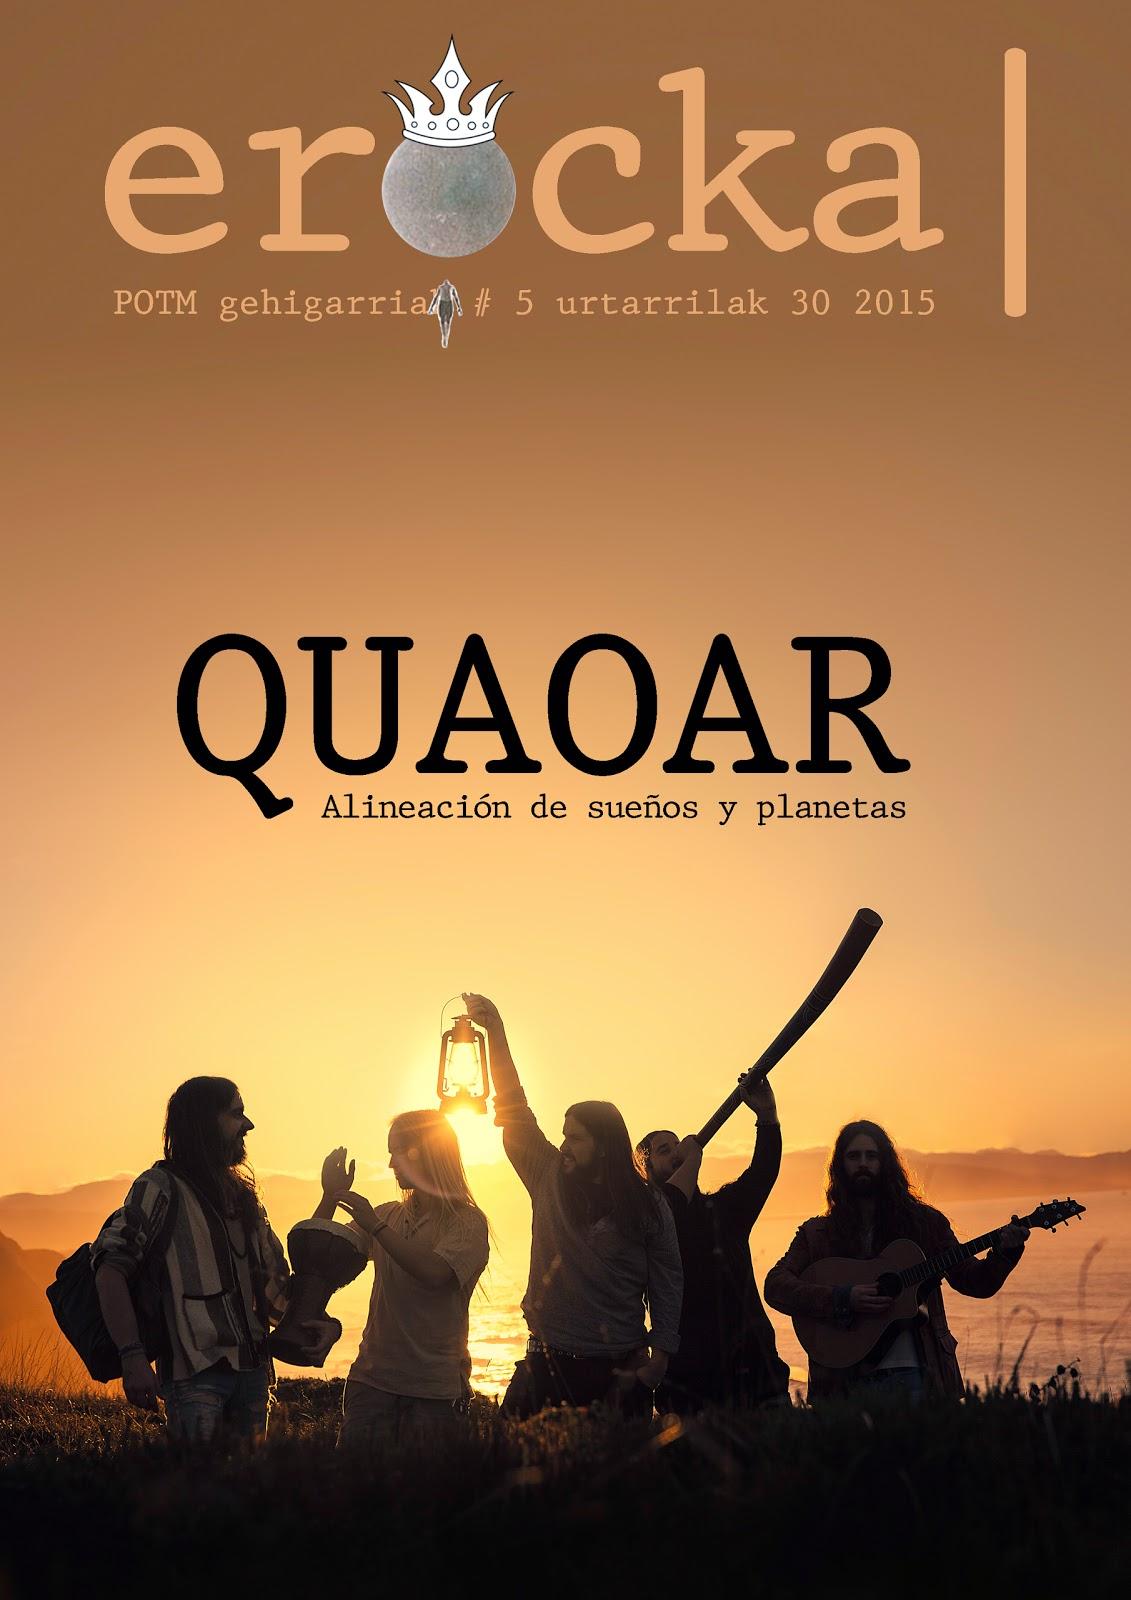 http://prideofthemonster.blogspot.com.es/2015/01/quaoar-alineacion-de-suenos-y-planetas.html